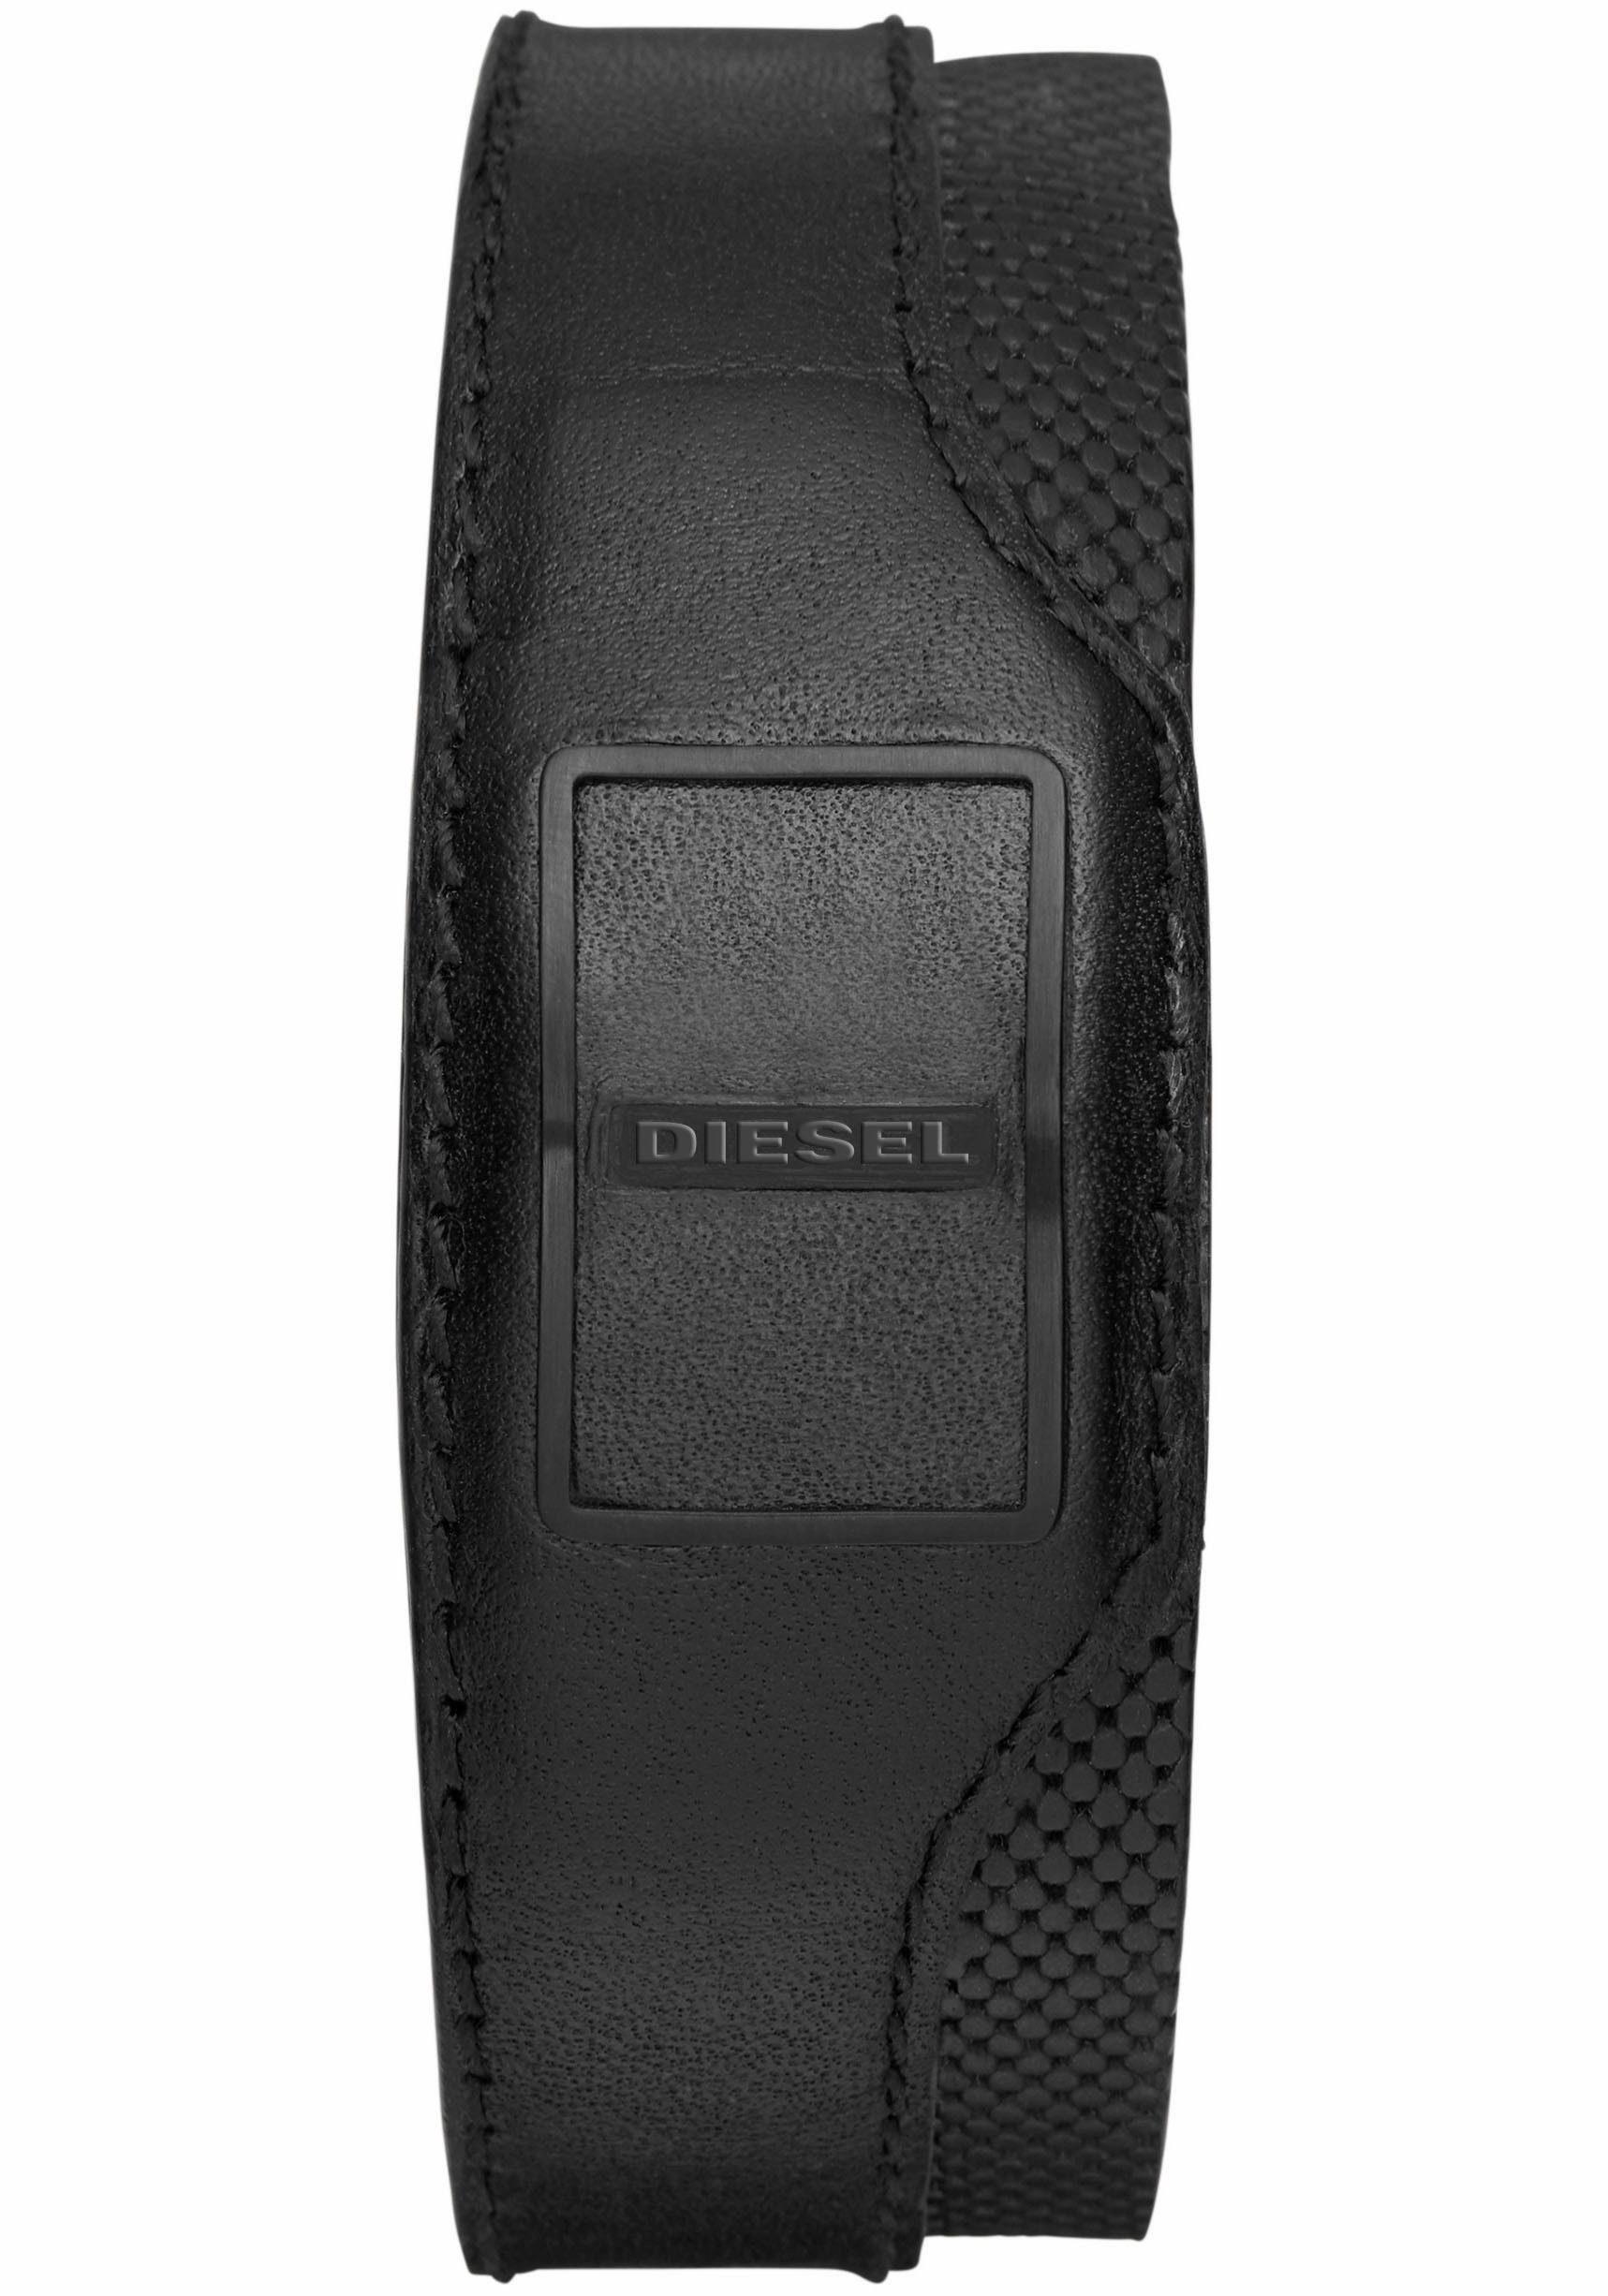 DIESEL ON Fitnessarmband »Activity Tracker, Diesel On Track, DXA1201«